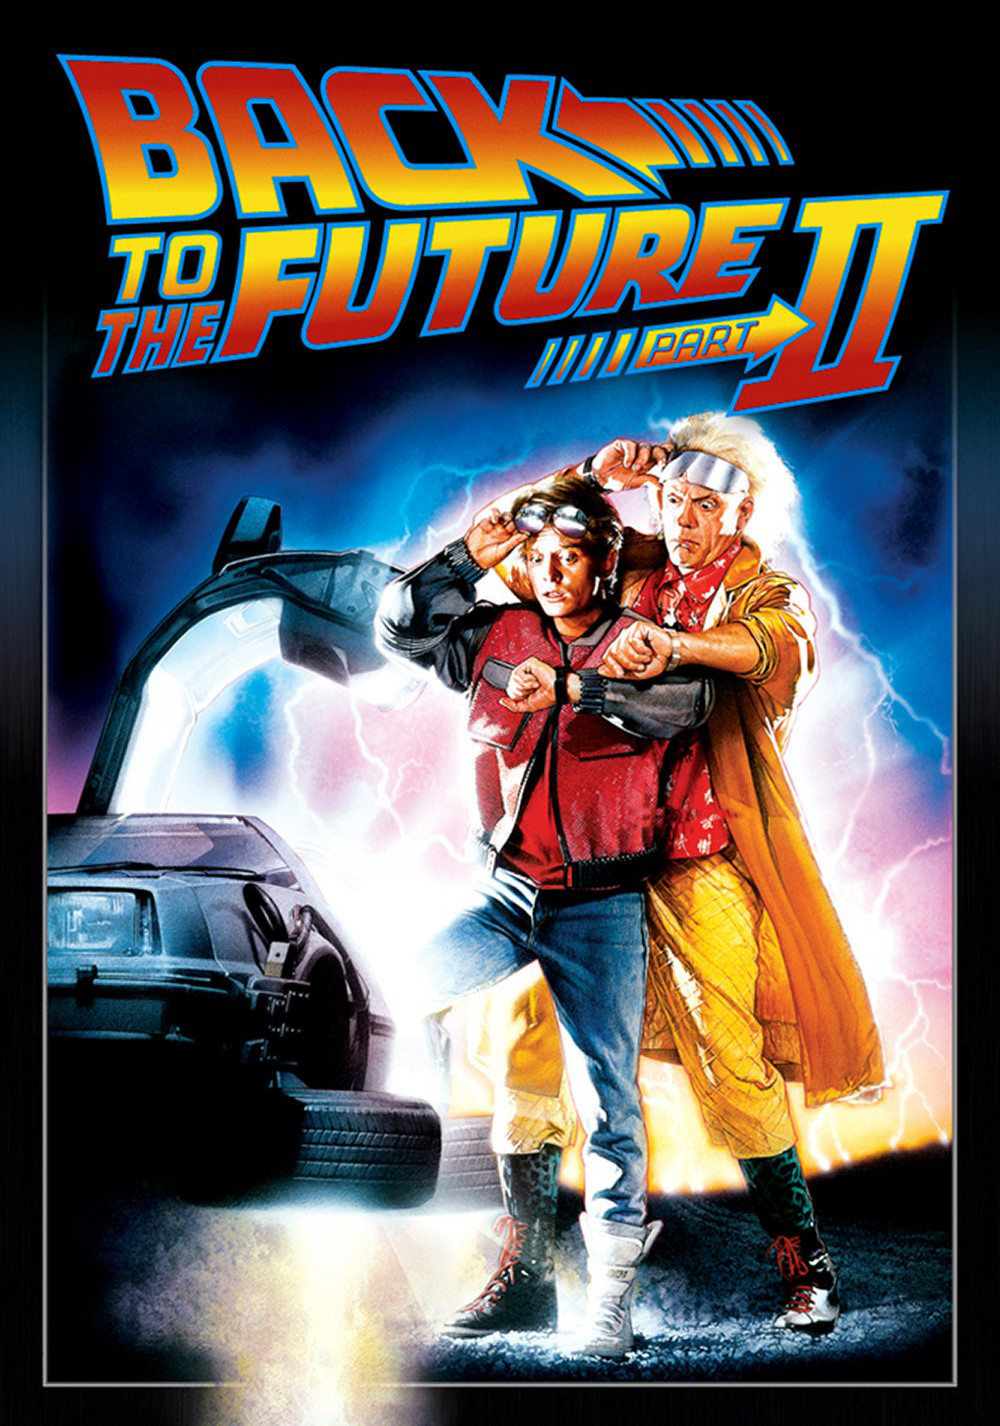 Back to the Future Part II | Movie fanart | fanart.tv